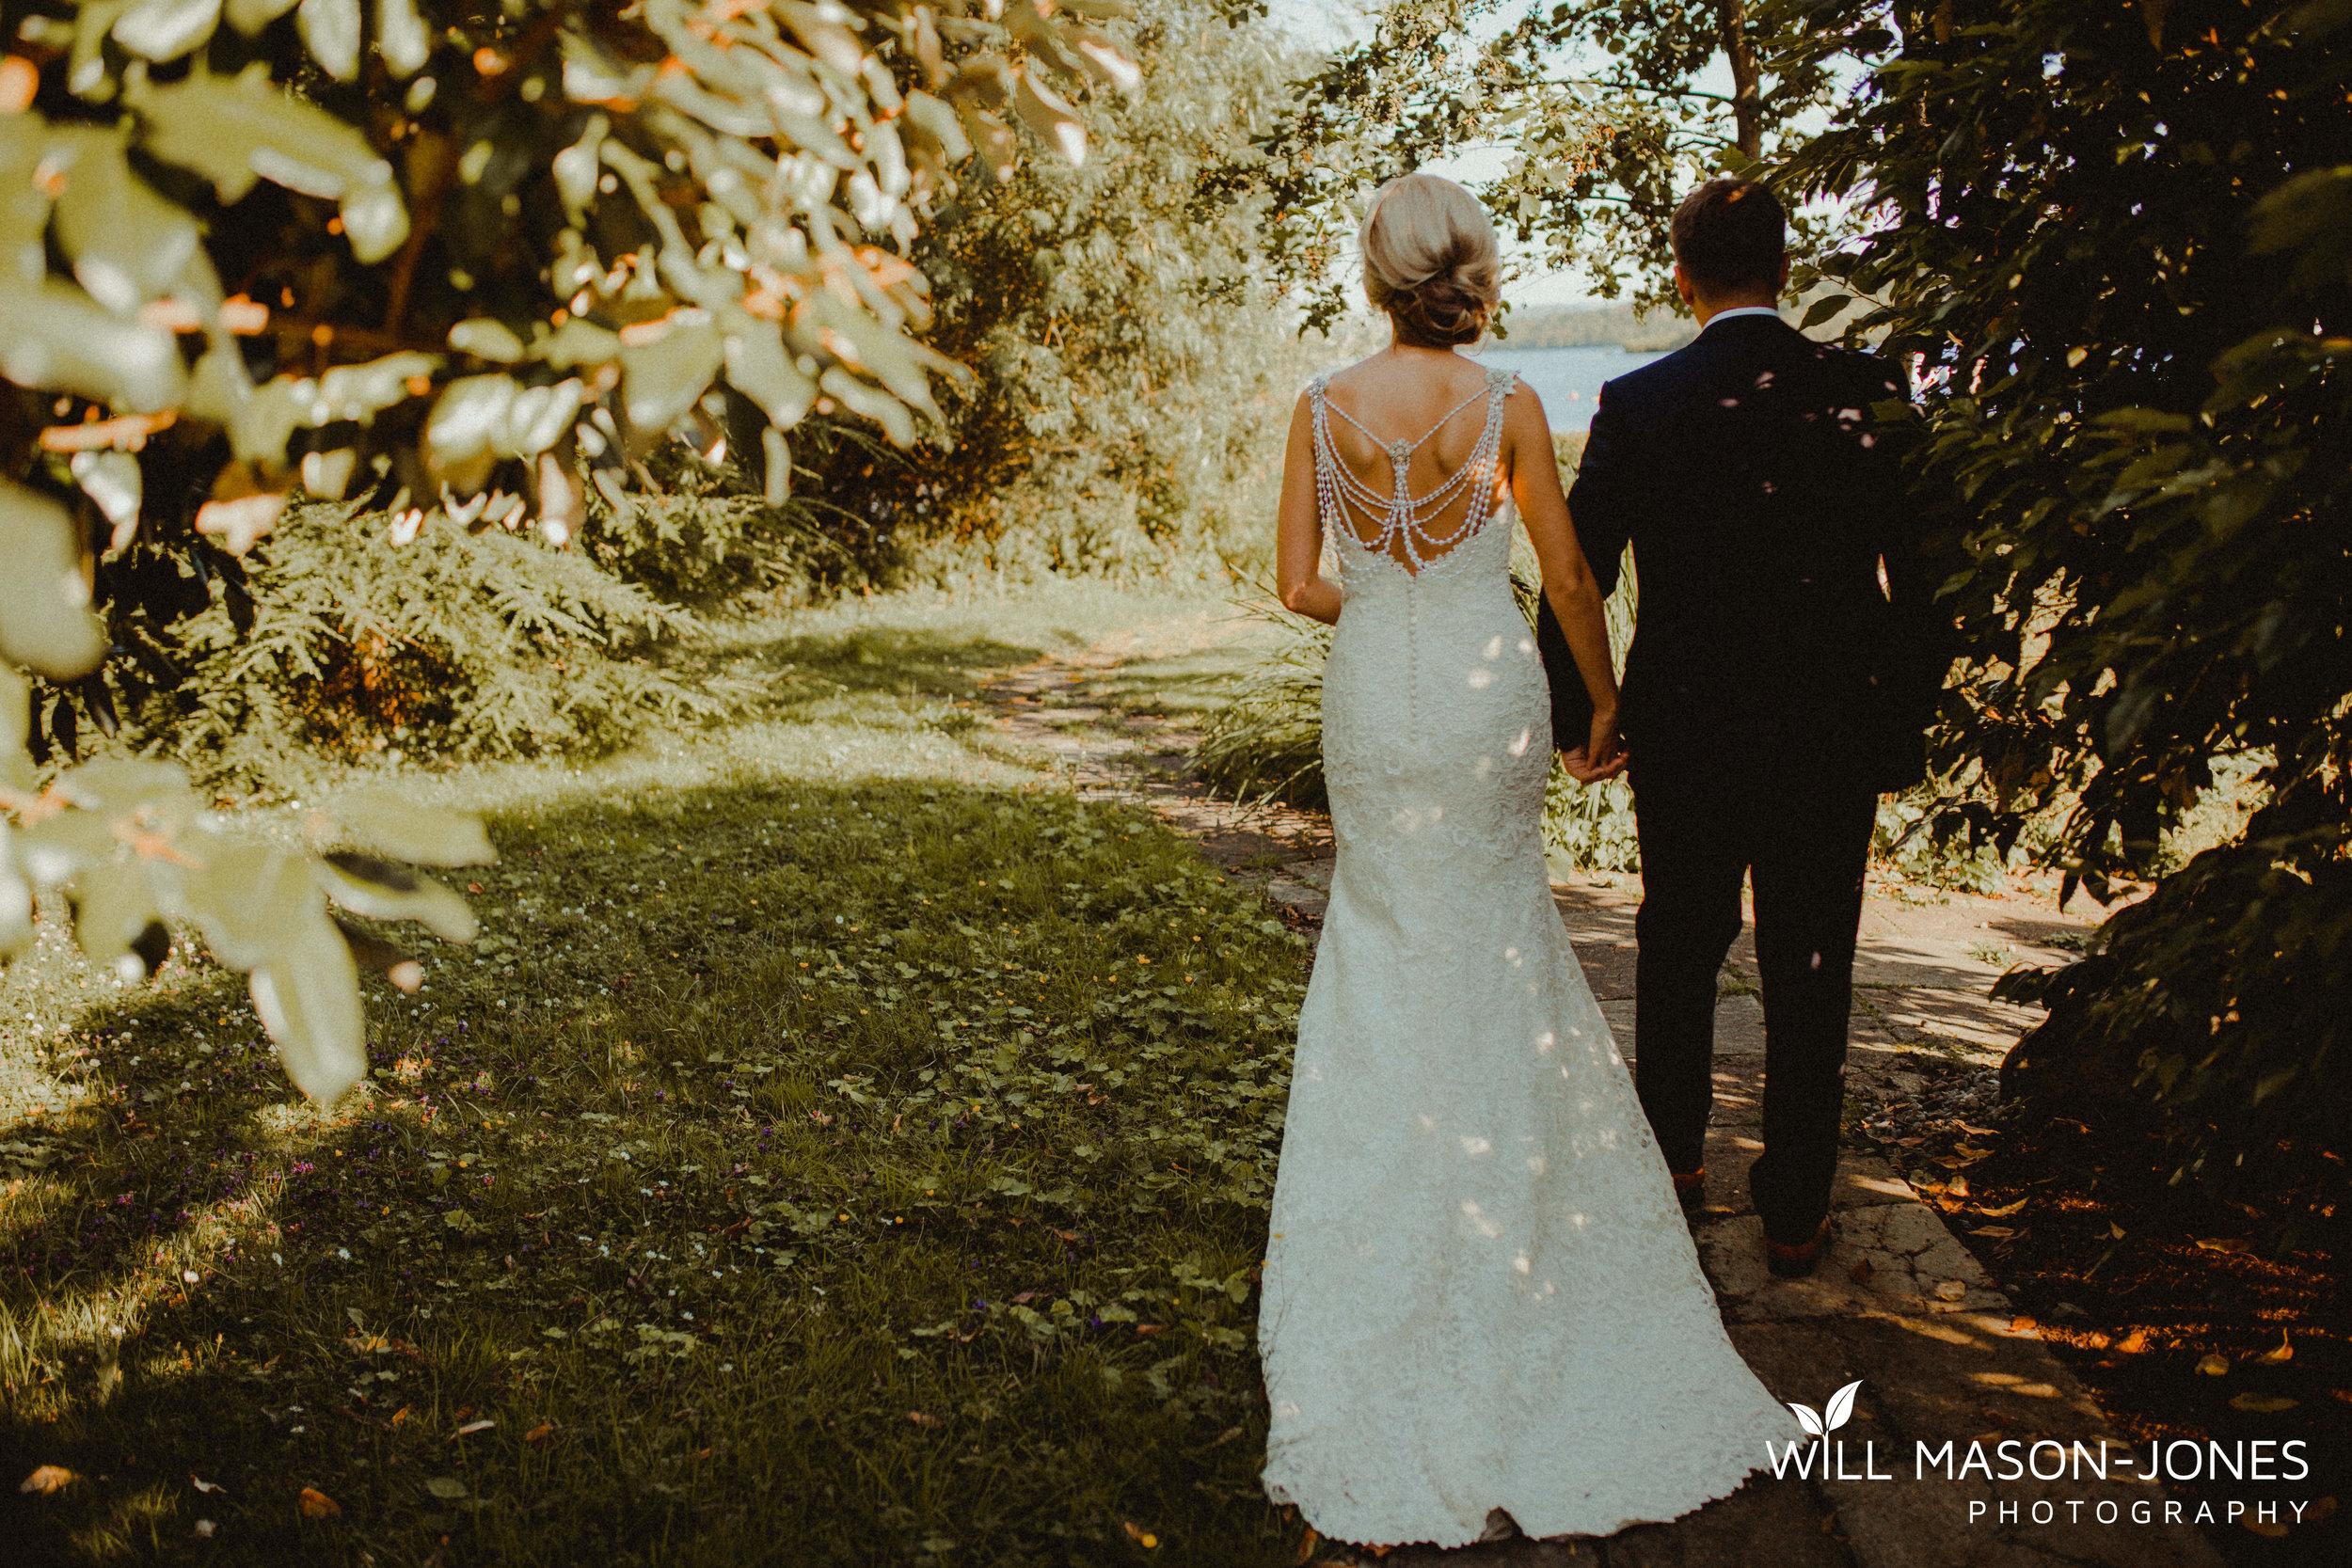 loch-lomond-destination-wedding-photographer-scotland-uk-wales-64.jpg